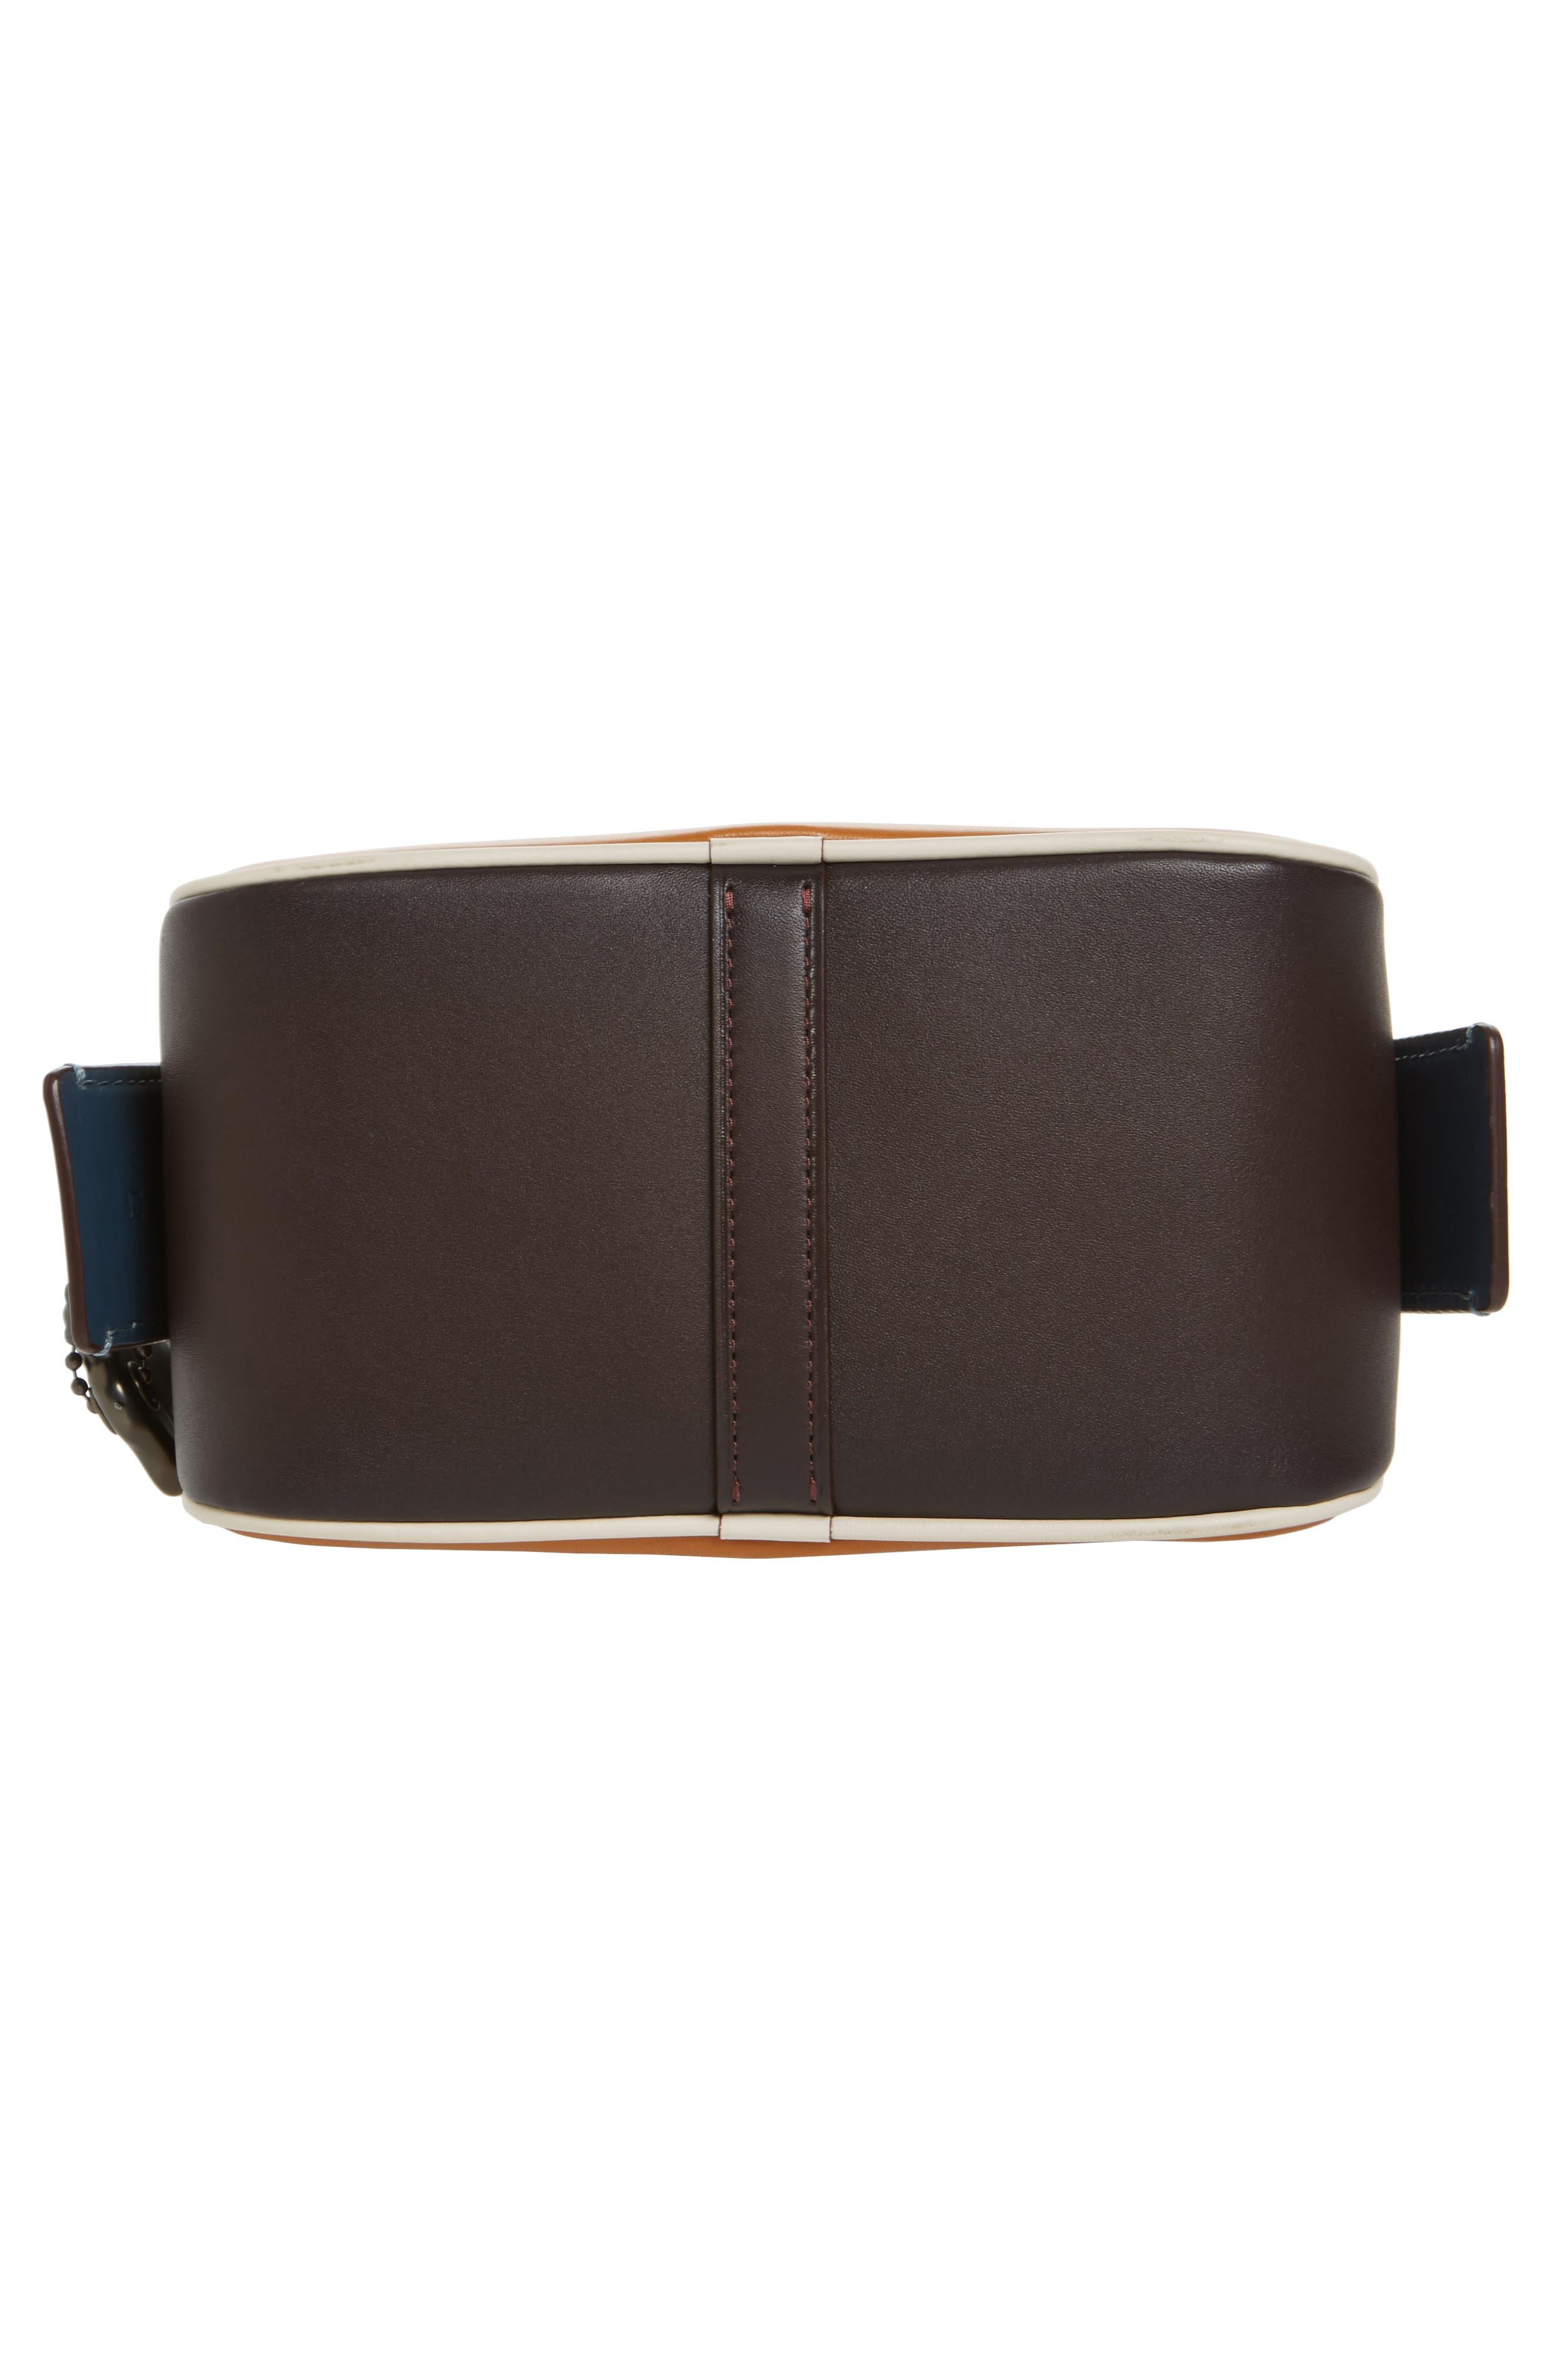 Rexy Leather Crossbody Bag,                             Alternate thumbnail 6, color,                             720